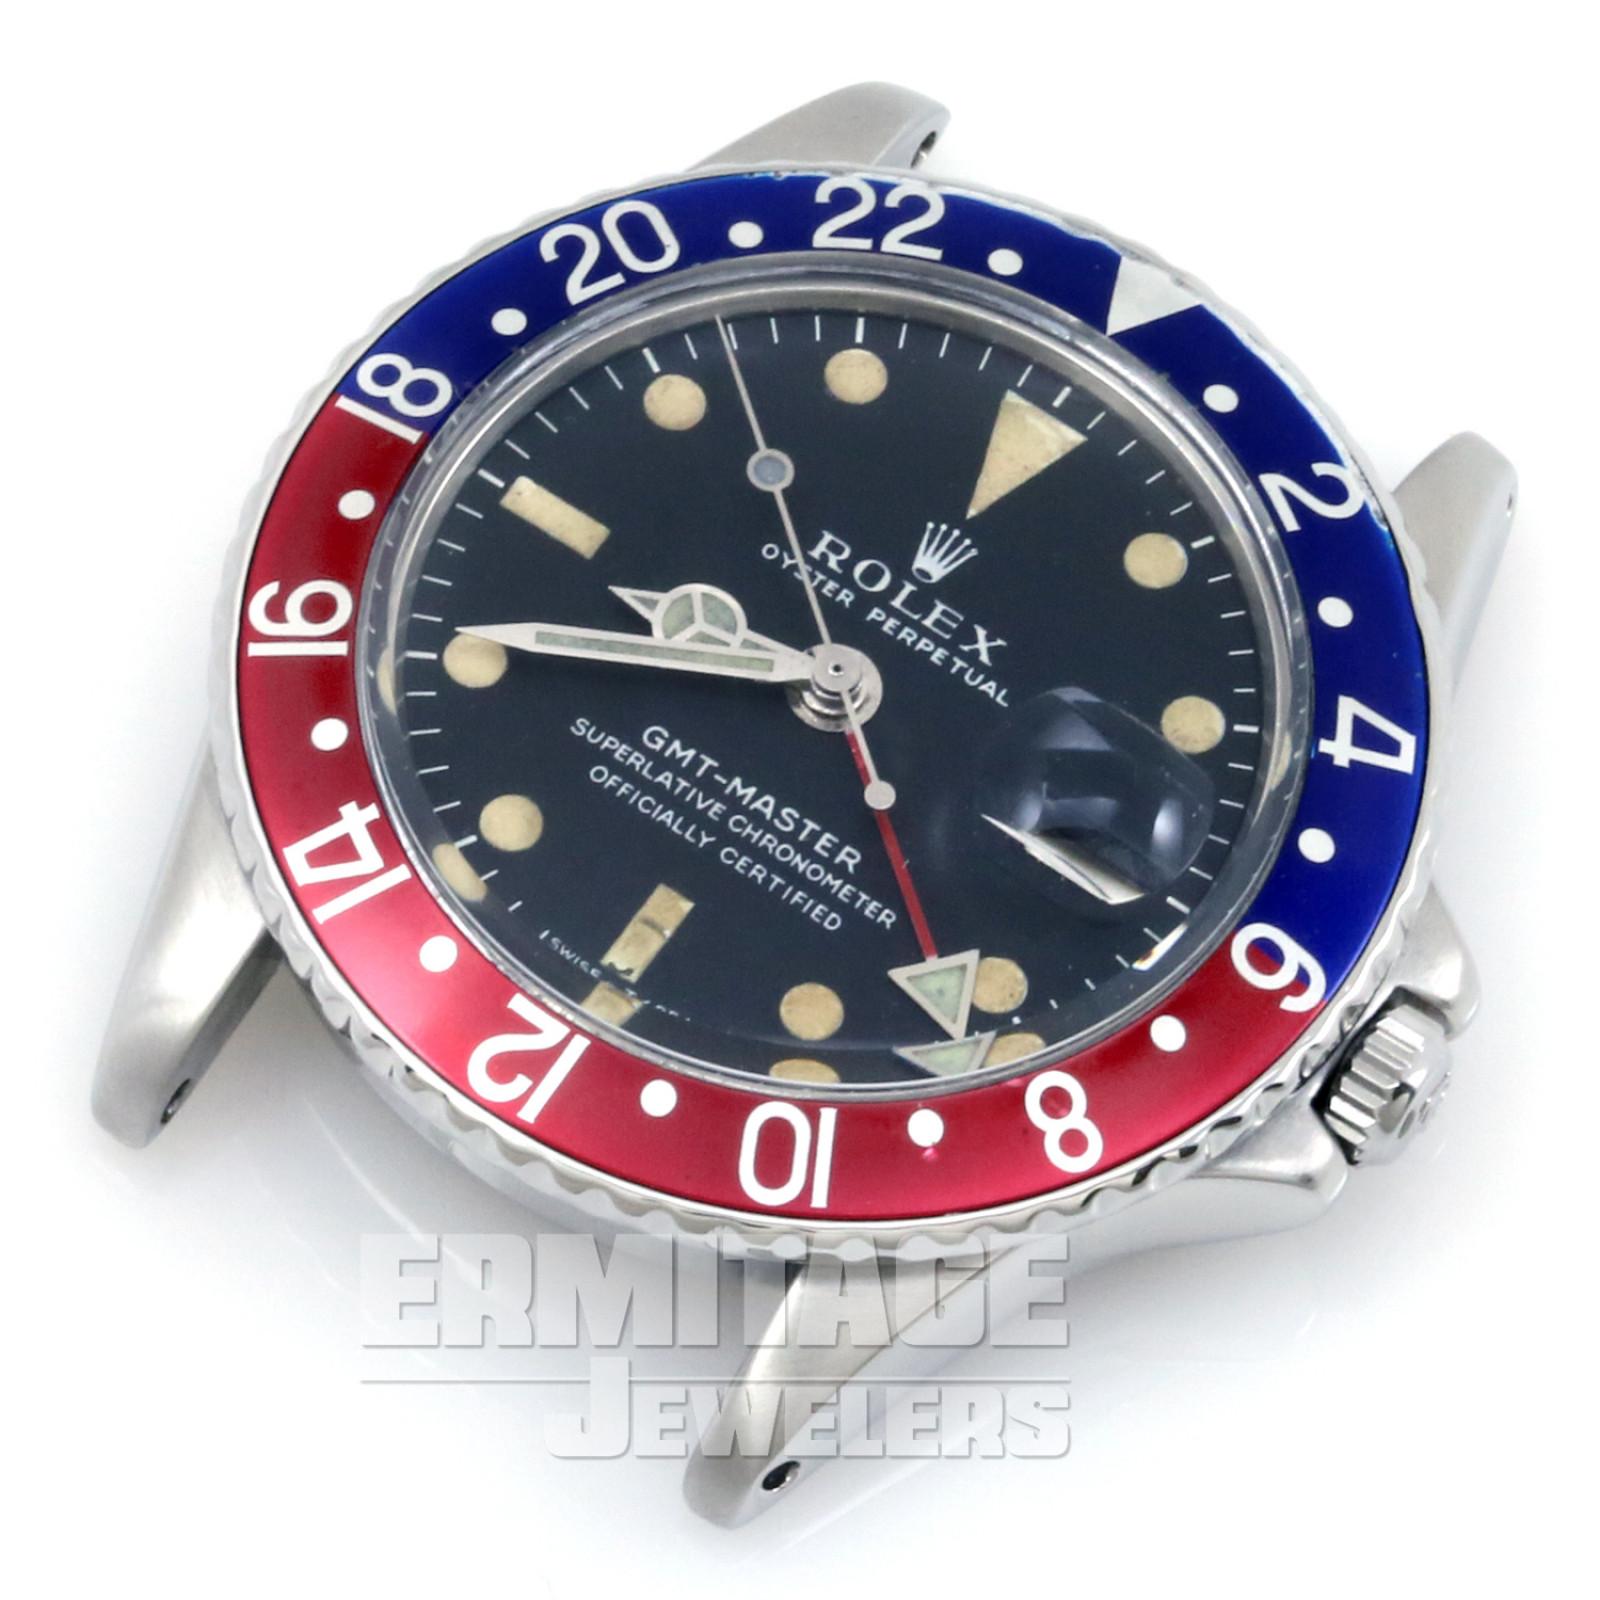 Vintage Rolex GMT-Master 1675 in Oyster